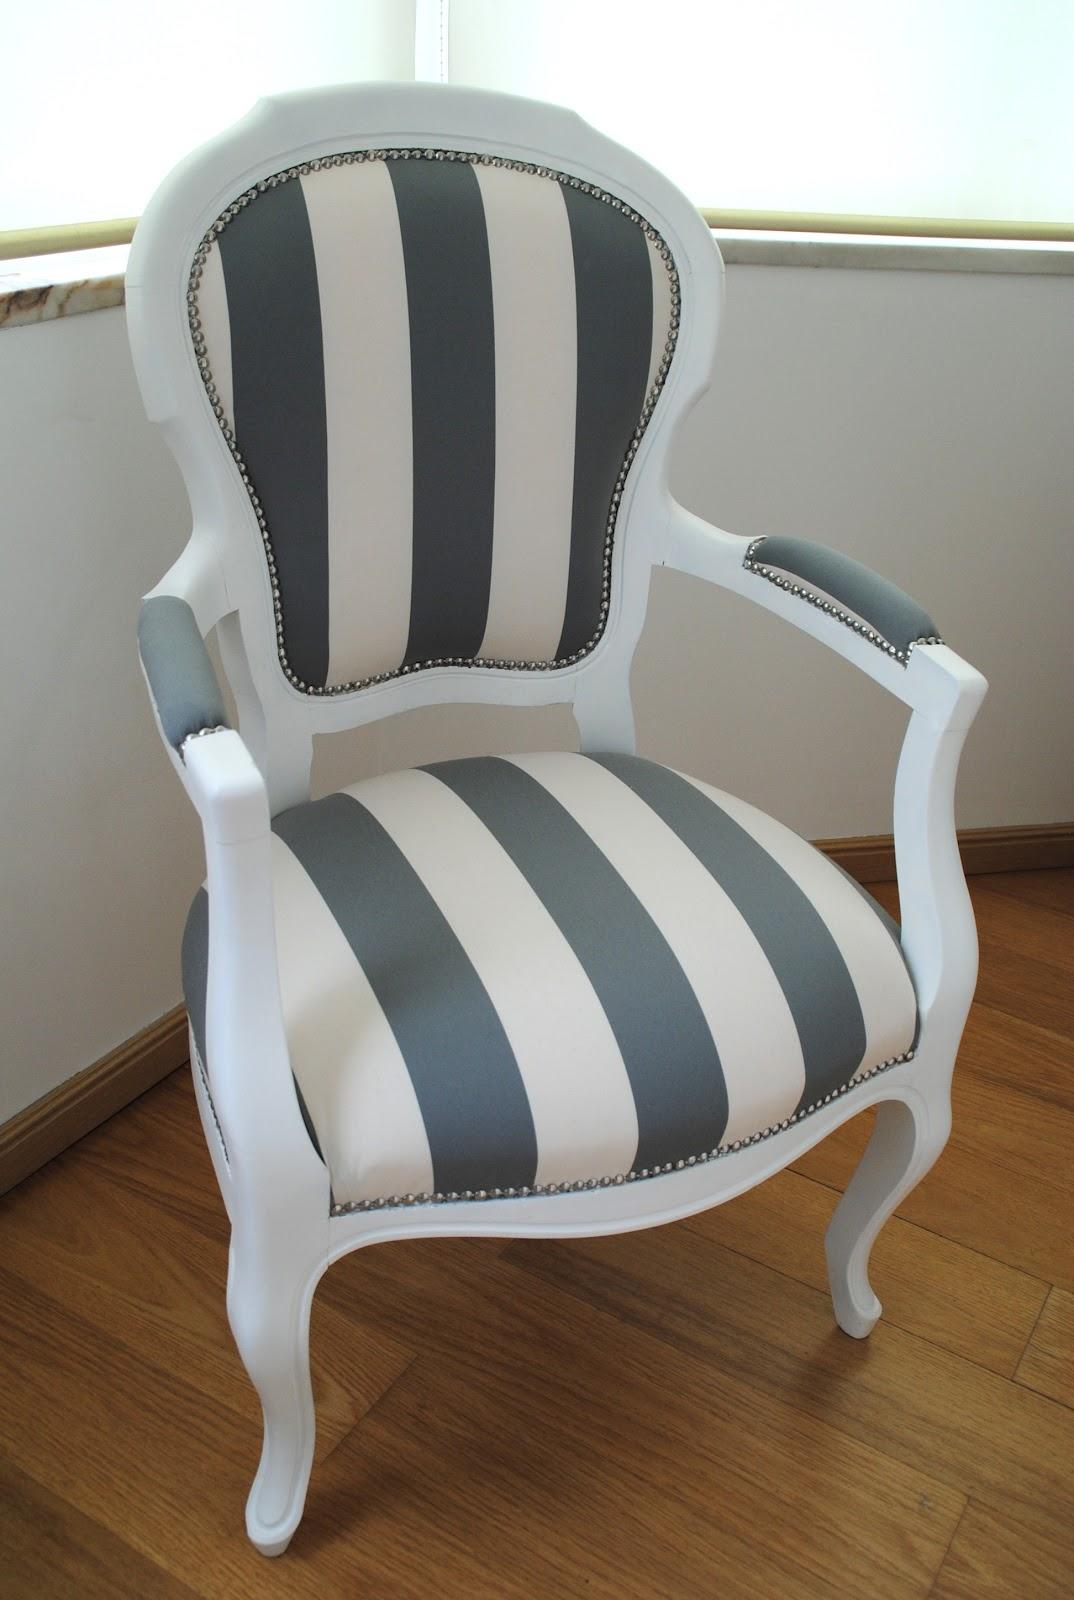 WHITE GLAM*: Reciclar cadeira #2 ** Recycling a armchair #2 #674626 1074x1600